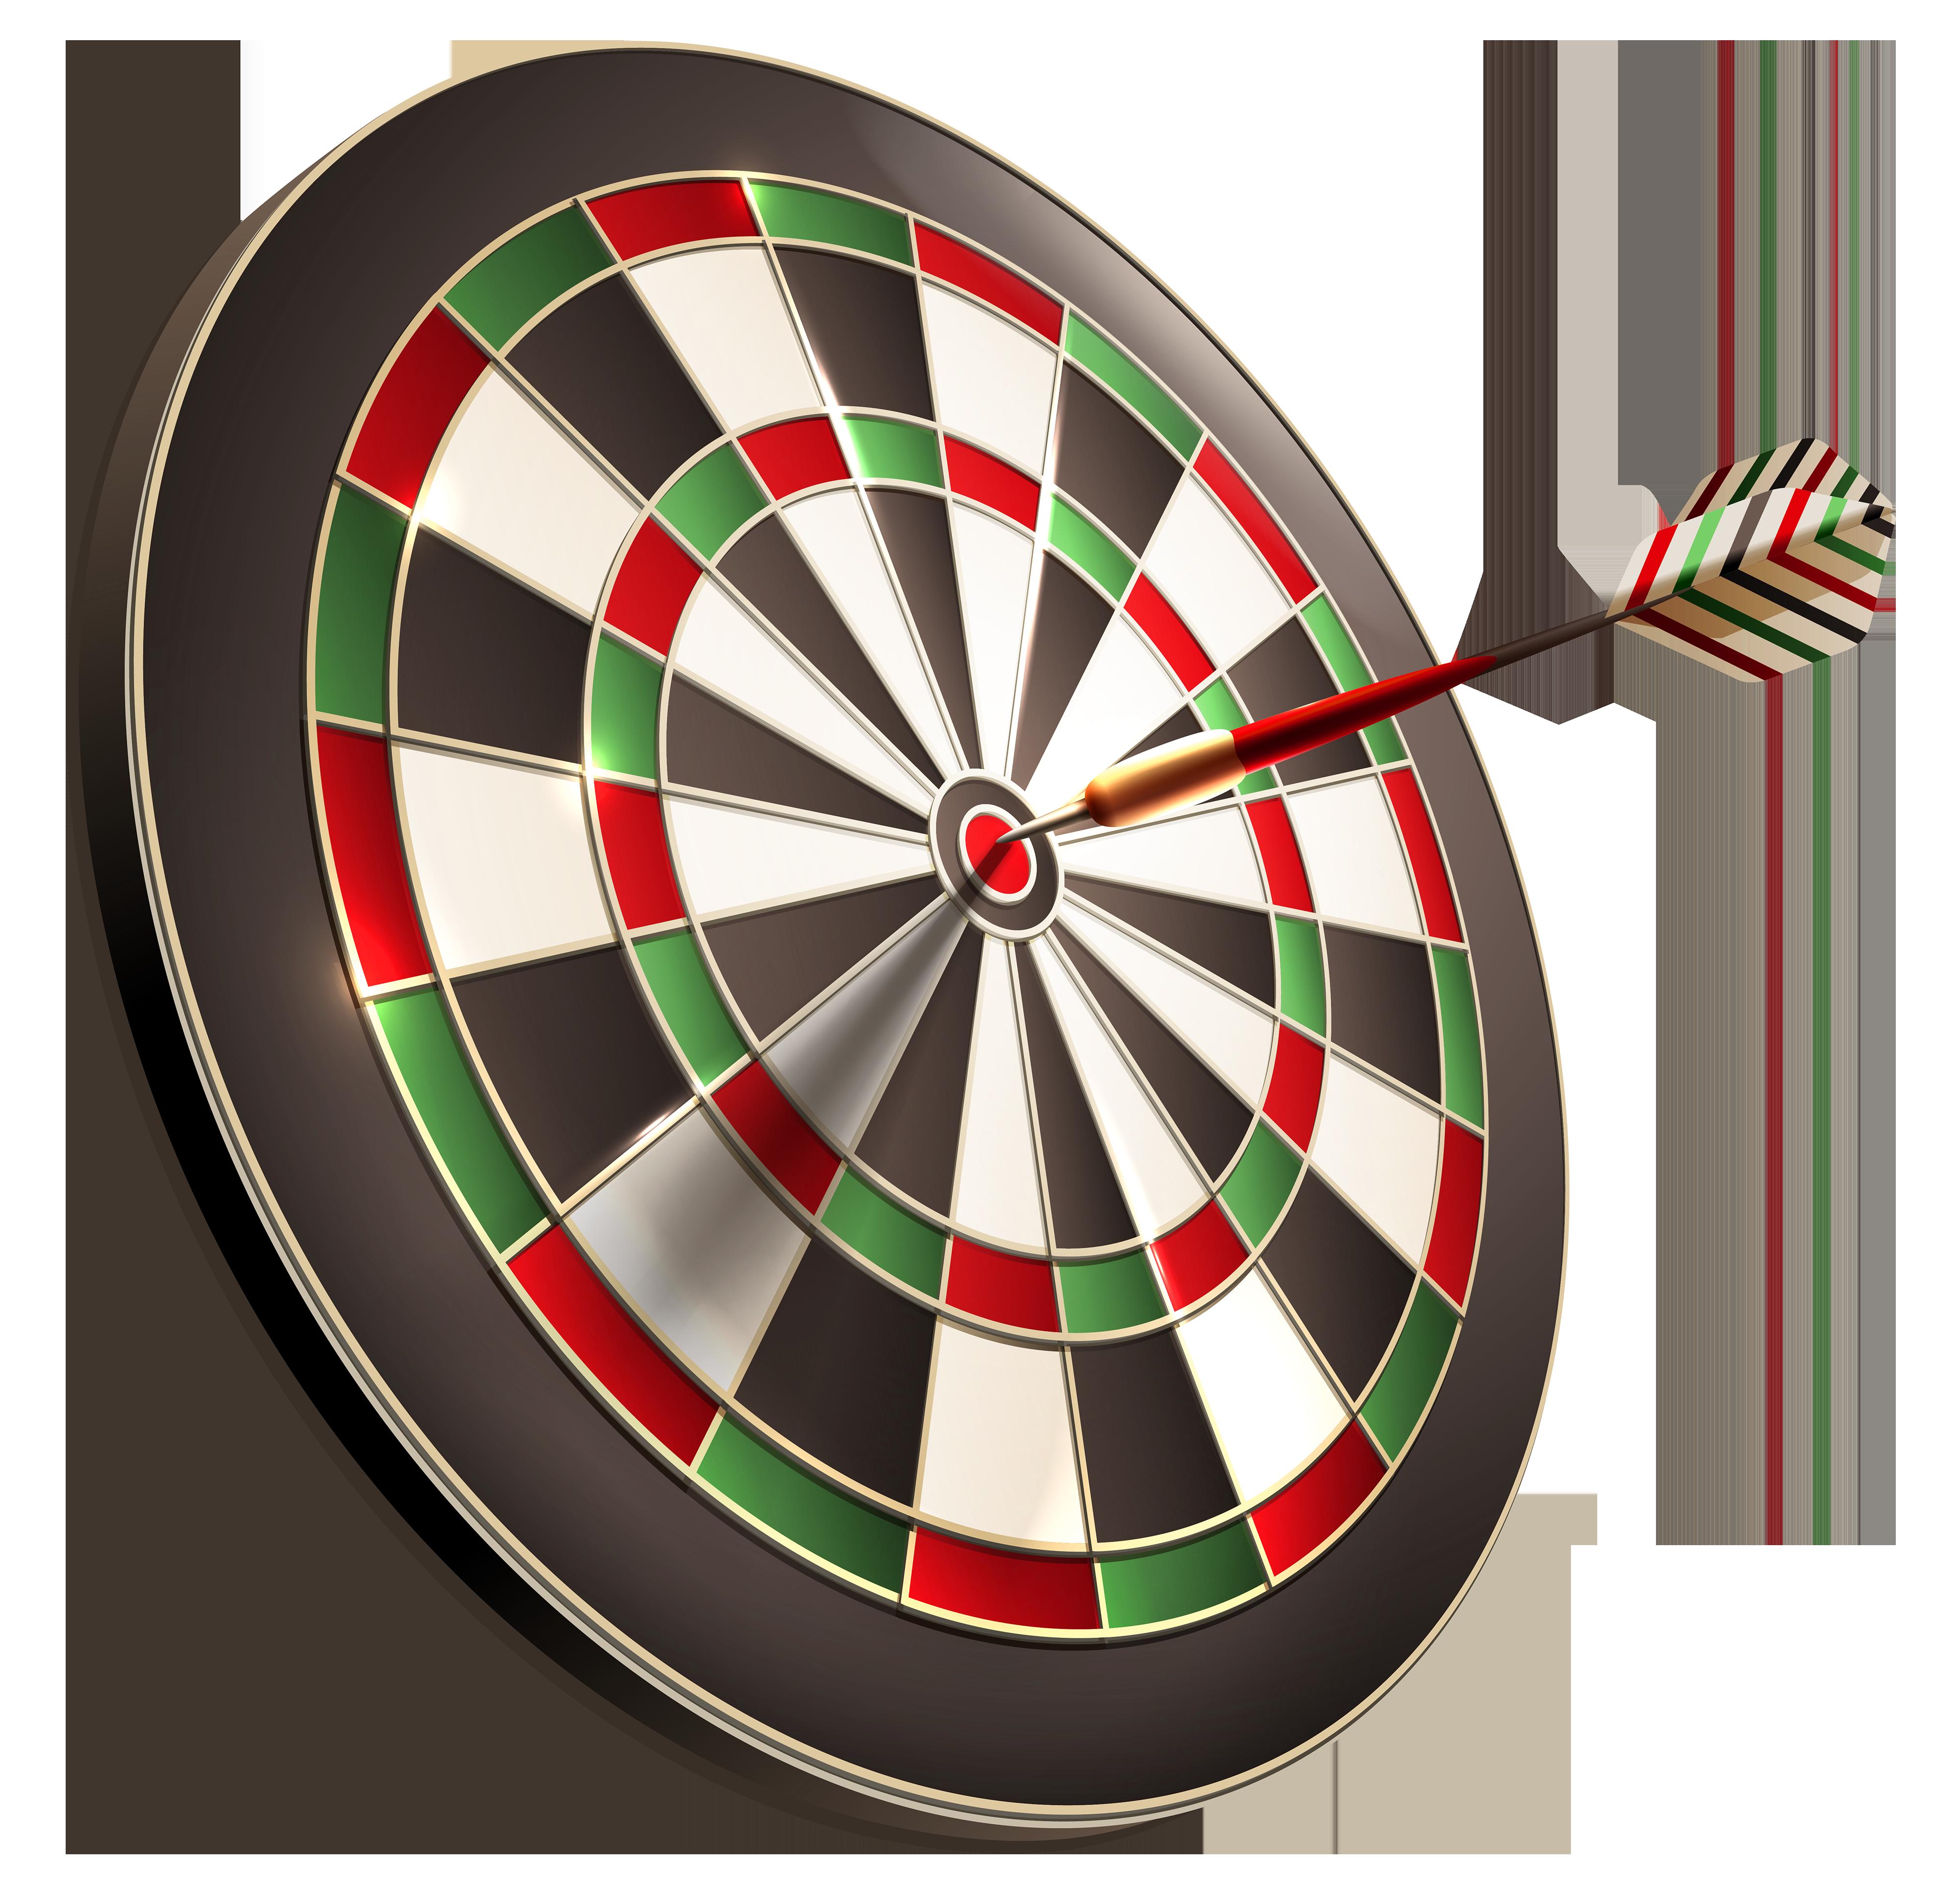 Darts Backgrounds, Compatible - PC, Mobile, Gadgets| 4000x3862 px